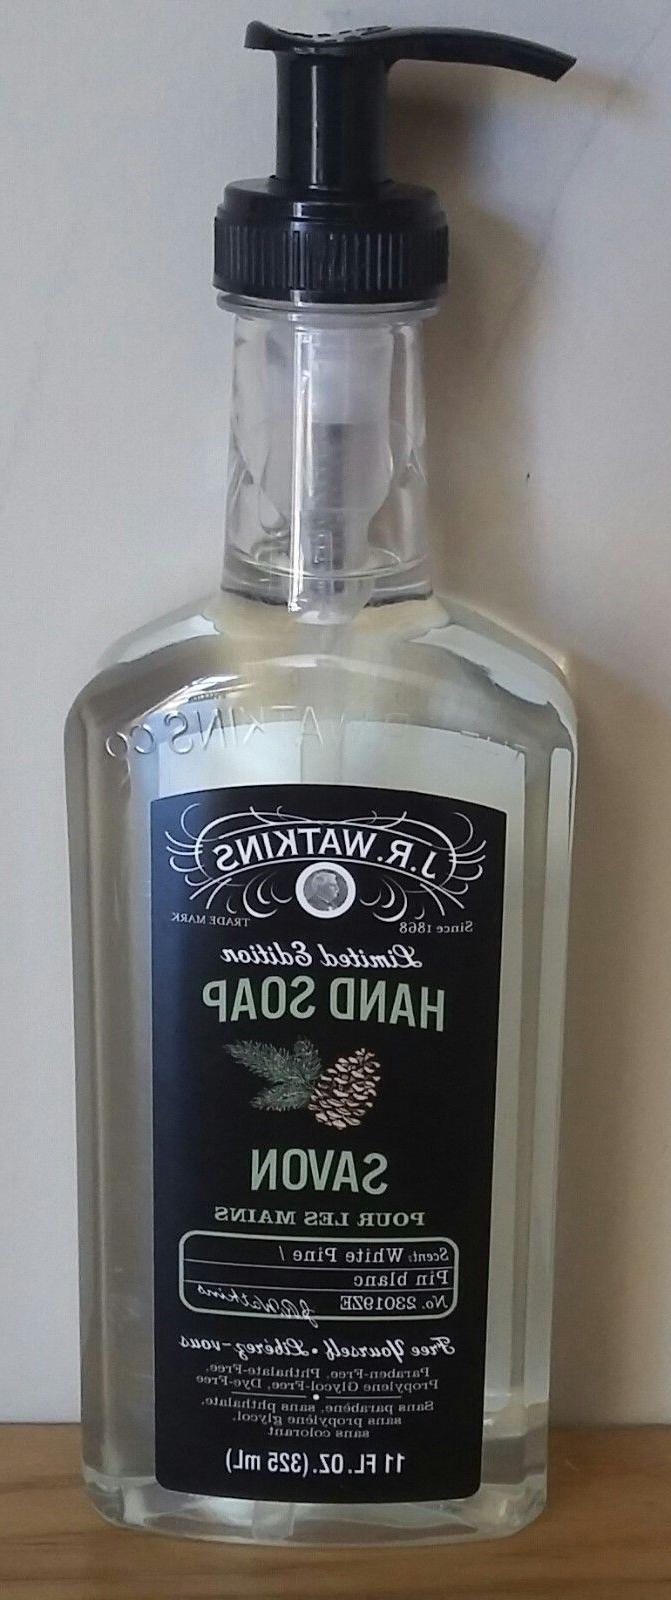 JR WATKINS Liquid Hand Soap - WHITE PINE scent  11 oz